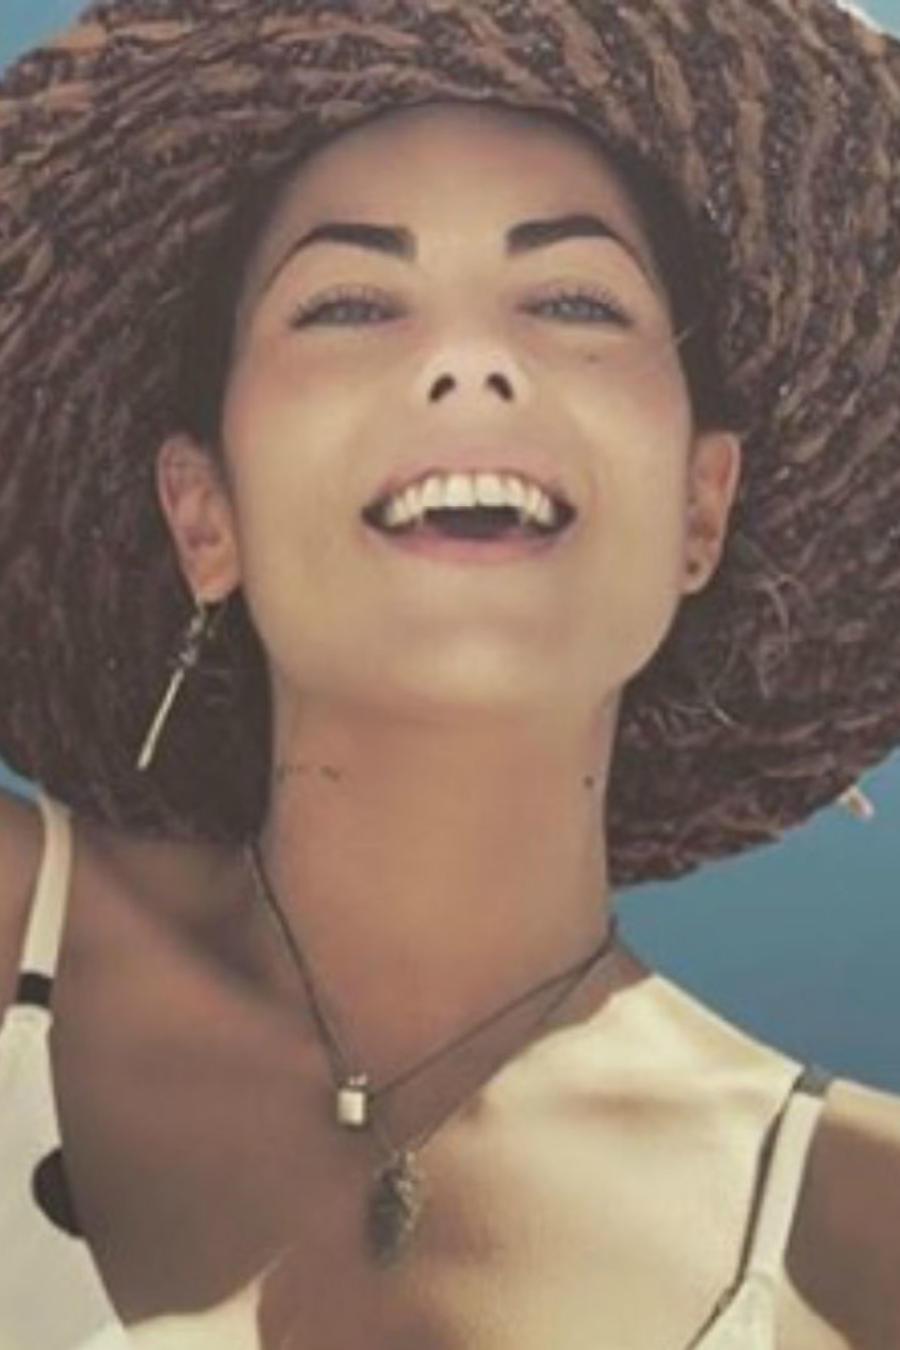 Bárbara Mori sonriendo